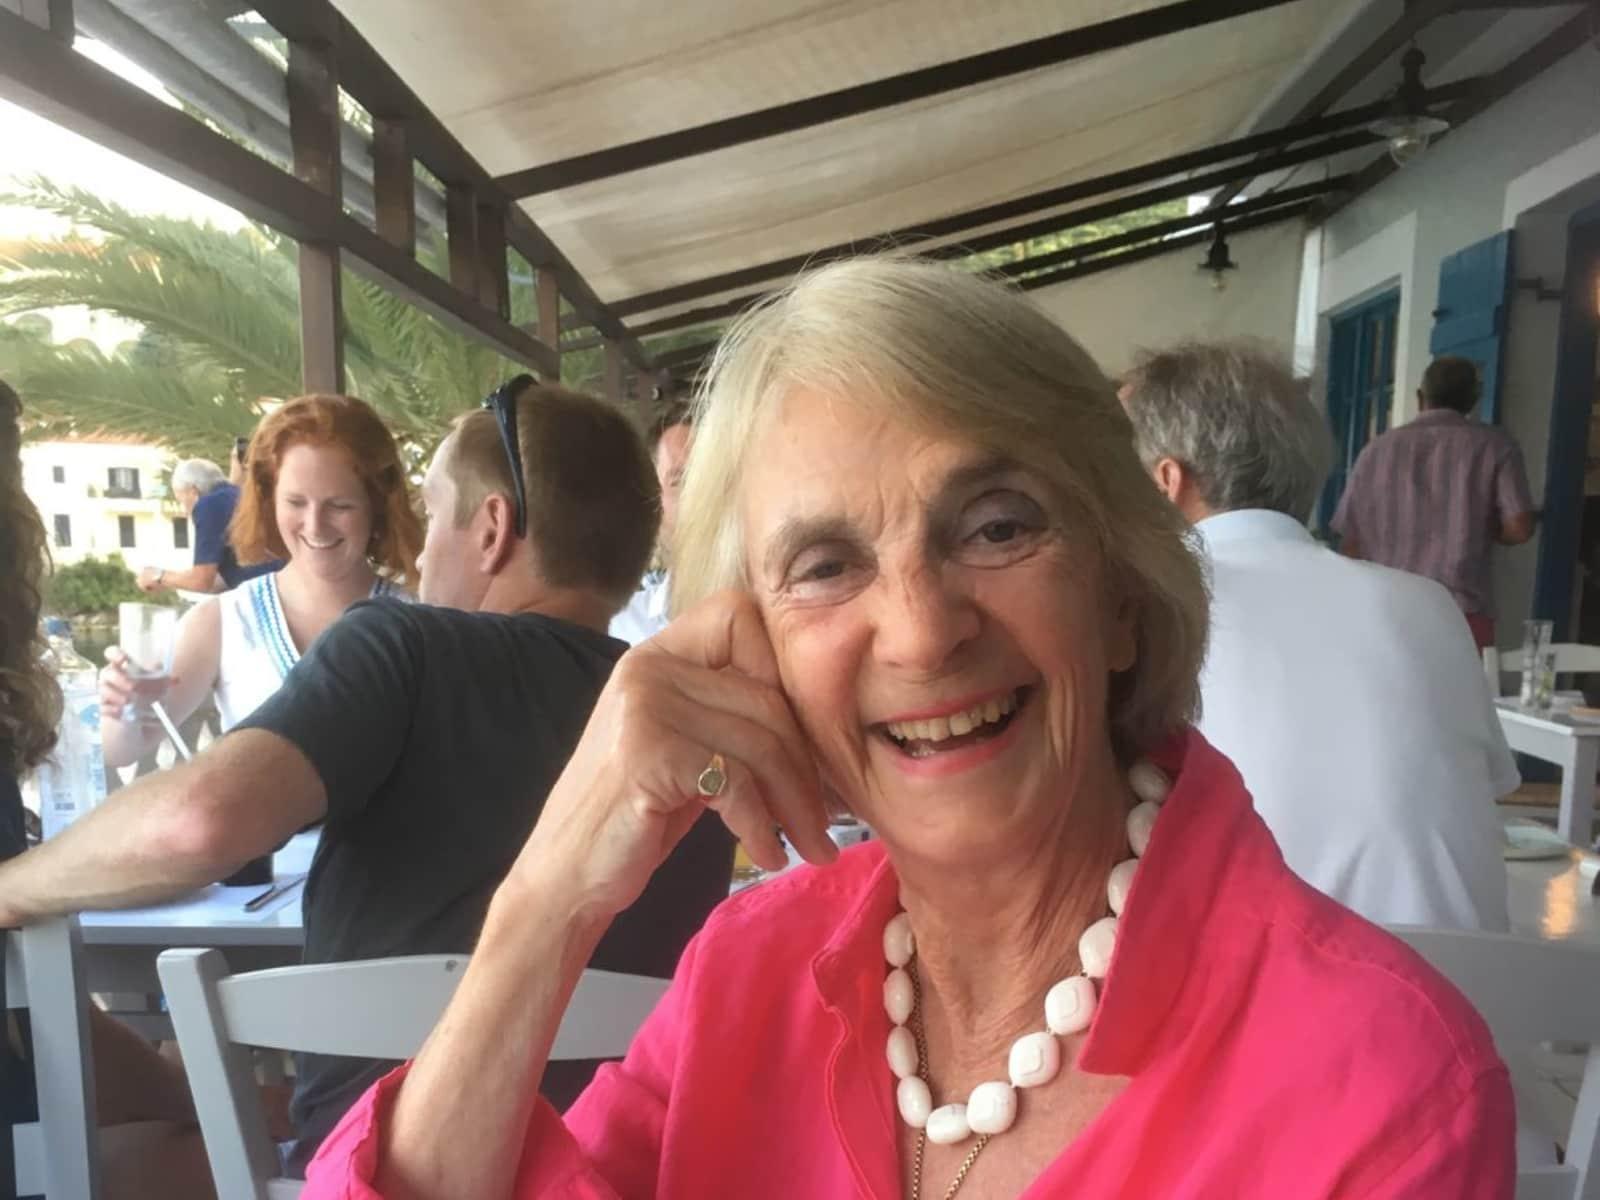 Maxine from Knightsbridge, United Kingdom